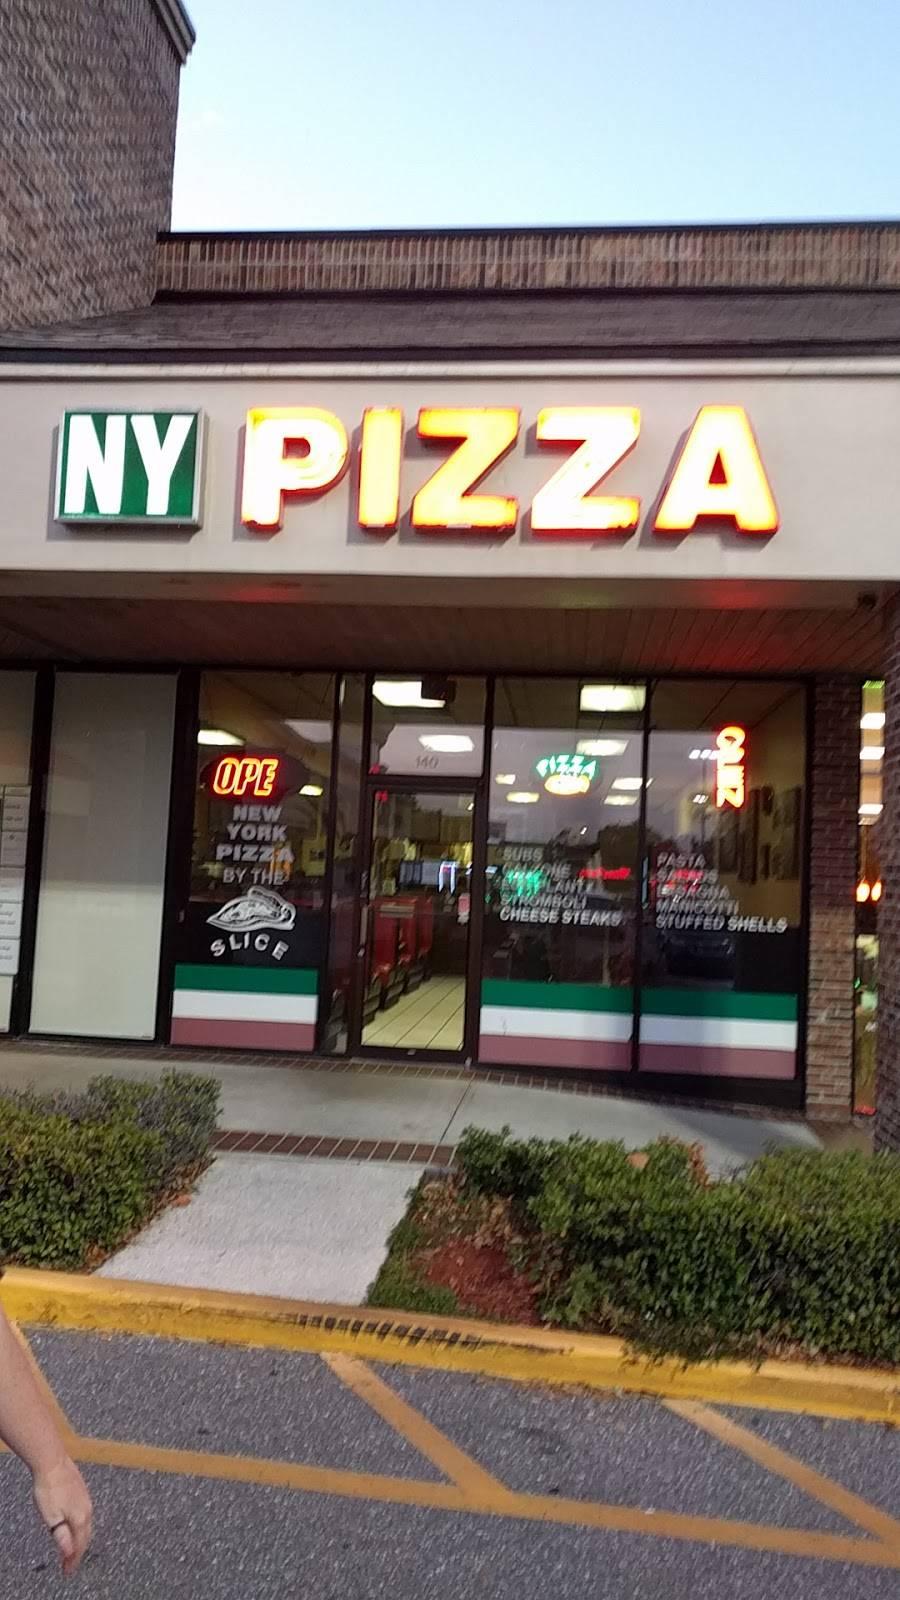 New York Pizza | restaurant | 7800 S US Hwy 17 92, Fern Park, FL 32730, USA | 4078308585 OR +1 407-830-8585